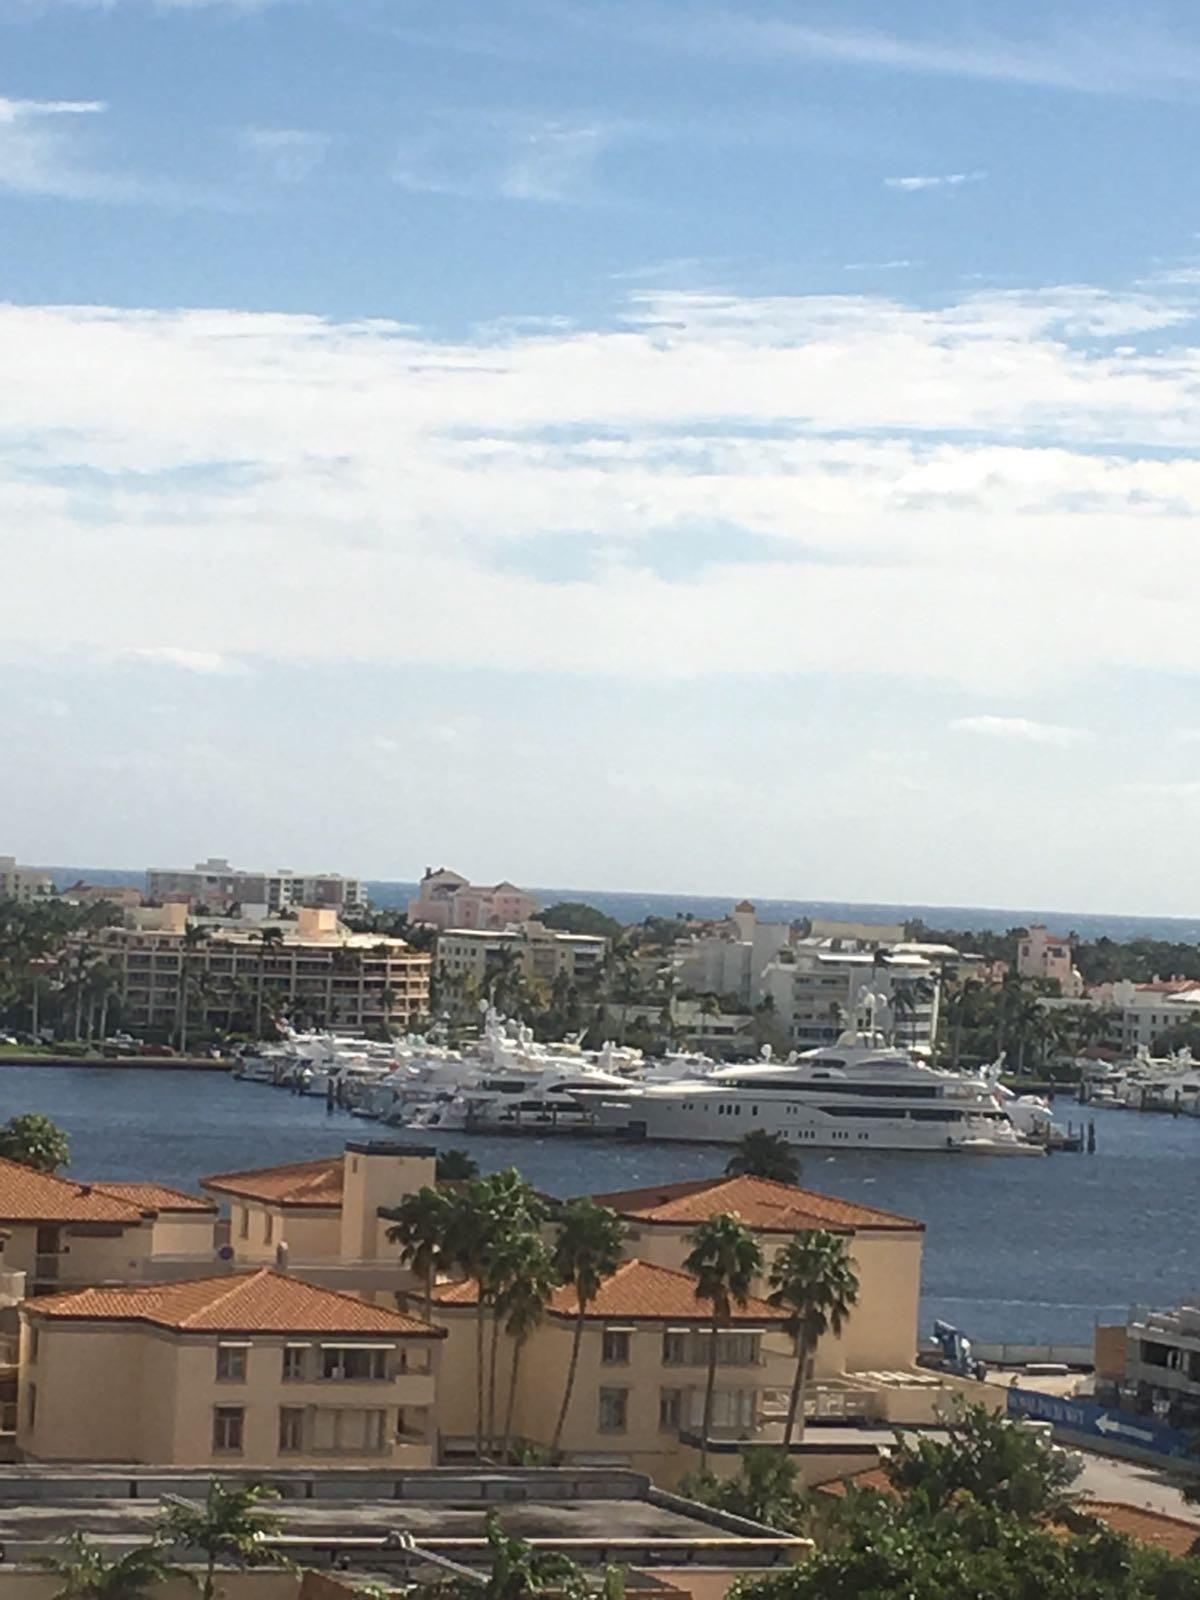 801 S Olive Avenue #707 - 33401 - FL - West Palm Beach